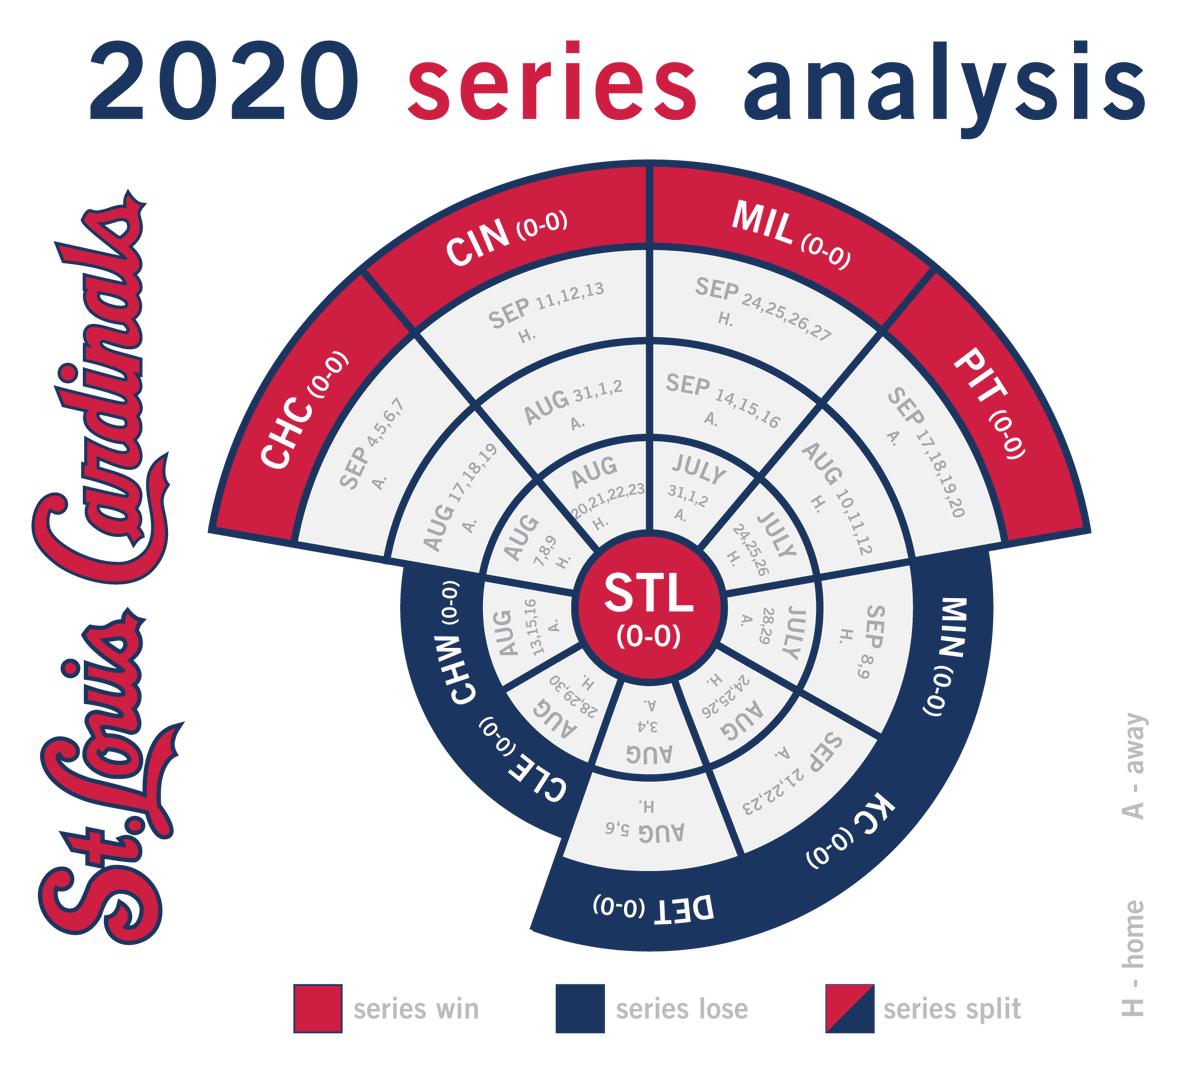 Cardinals brackets for 2020 season, break down by series. #MLB #Cardinals #STLCards   https://t.co/B7WYiseWzQ https://t.co/bg5o6xwbCP